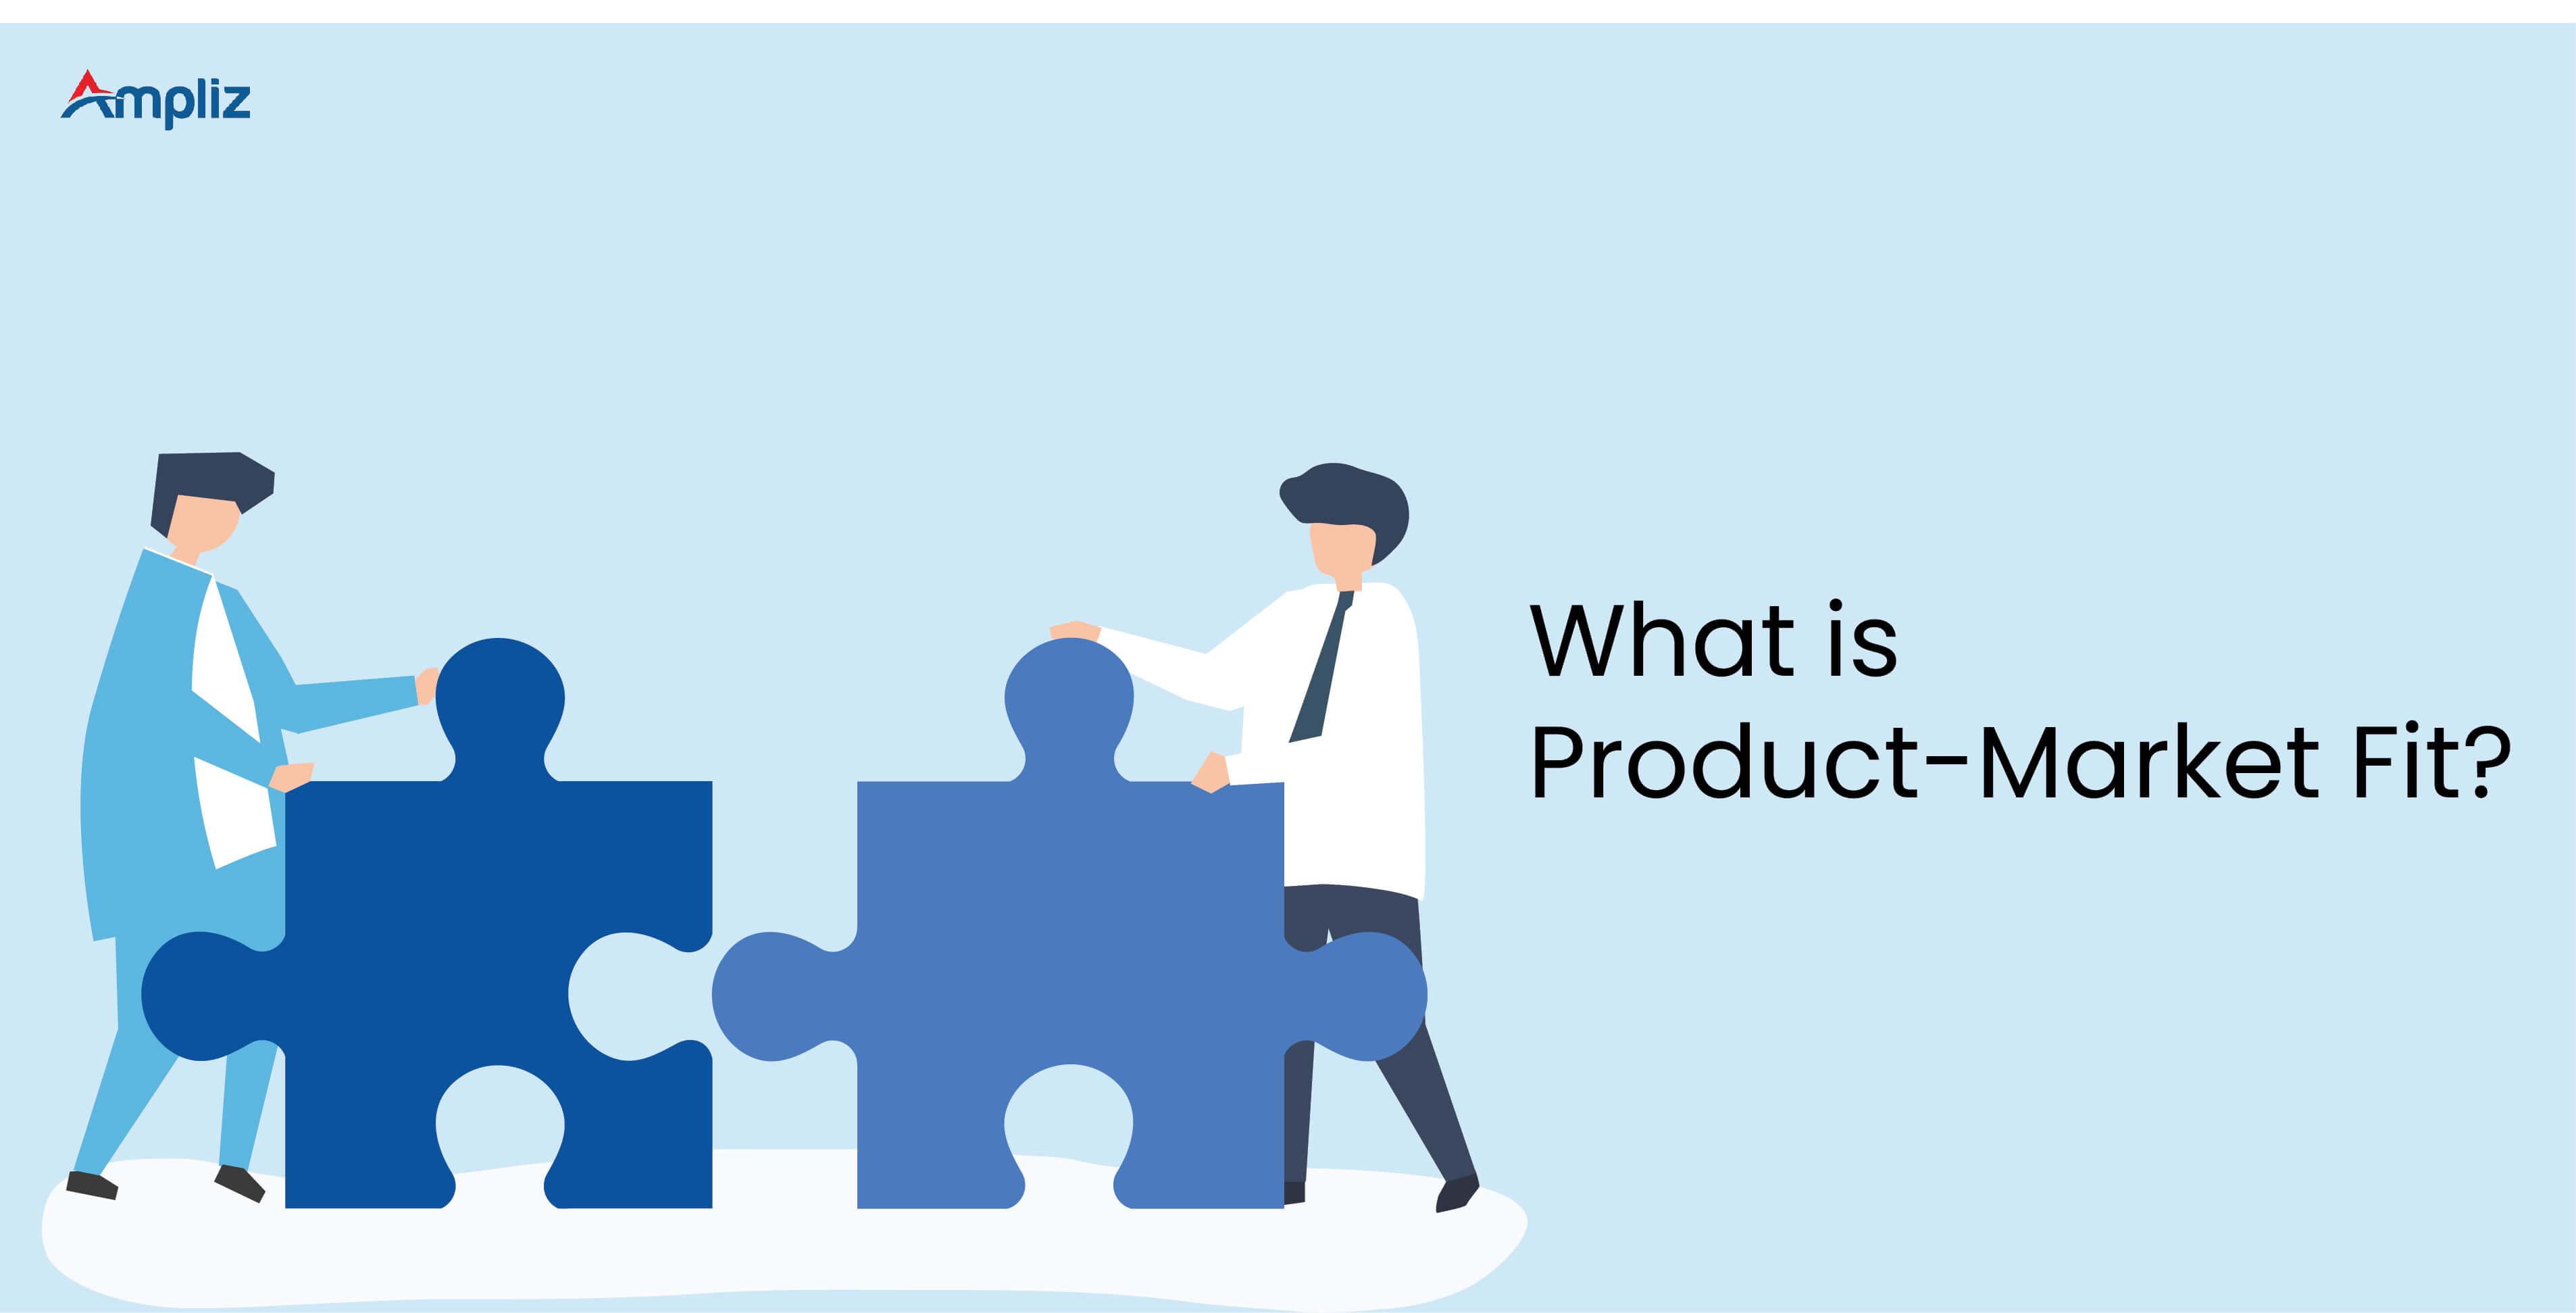 Product-Market Fit